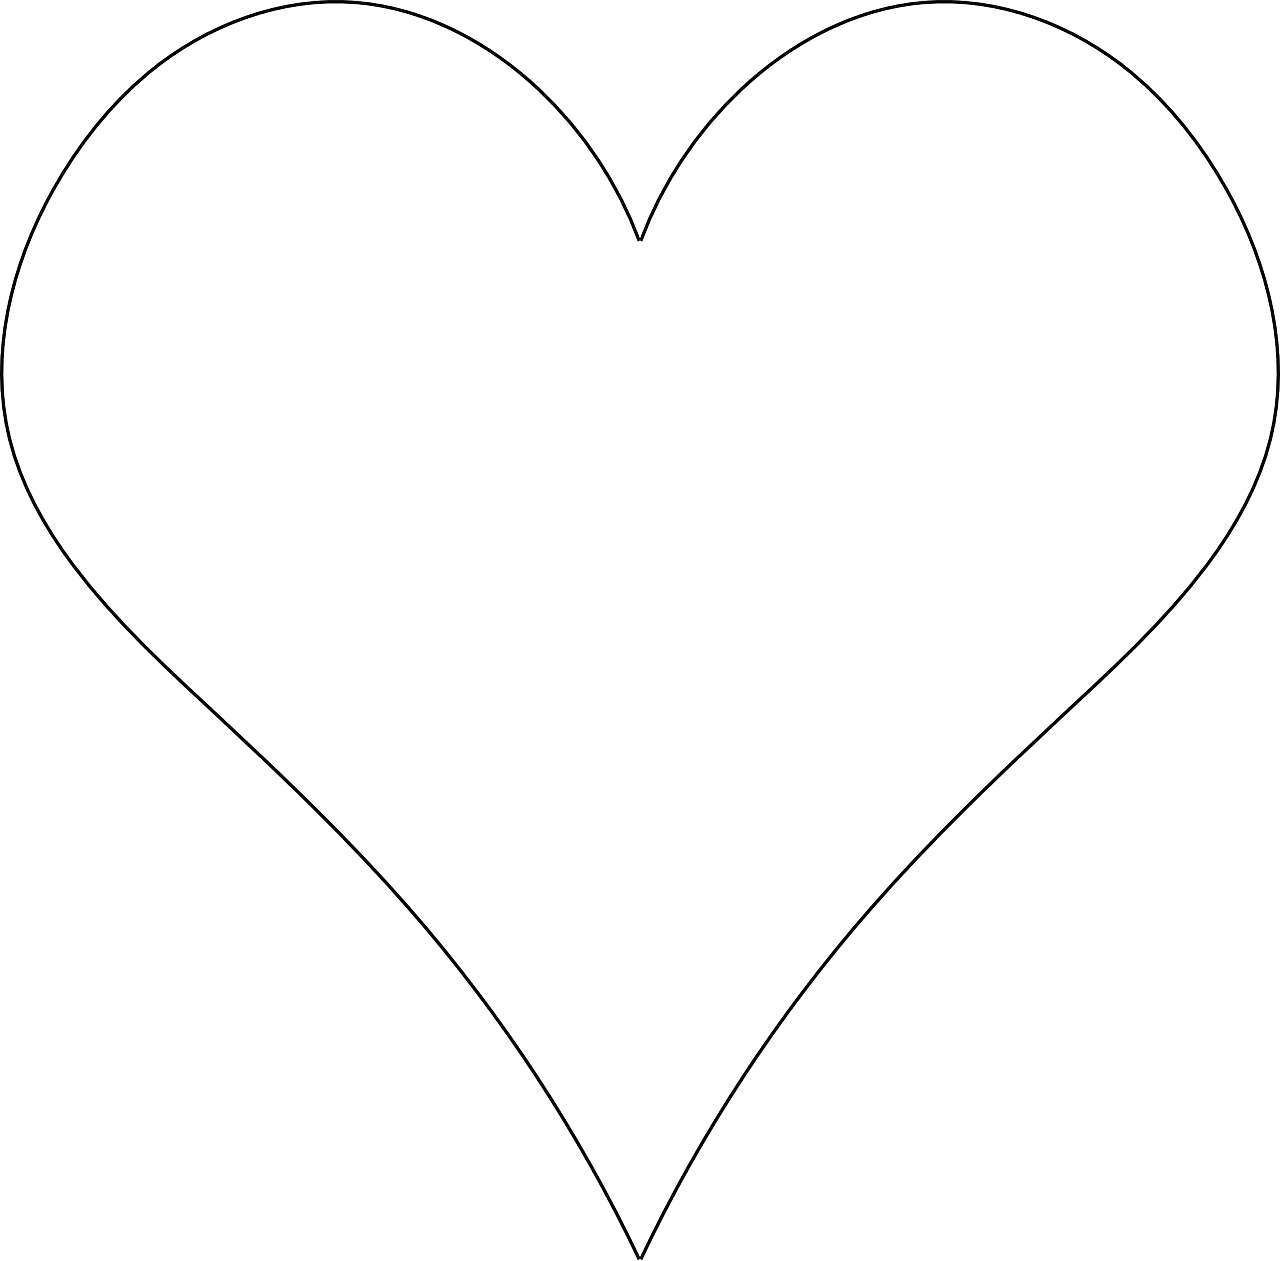 Контур сердца картинки